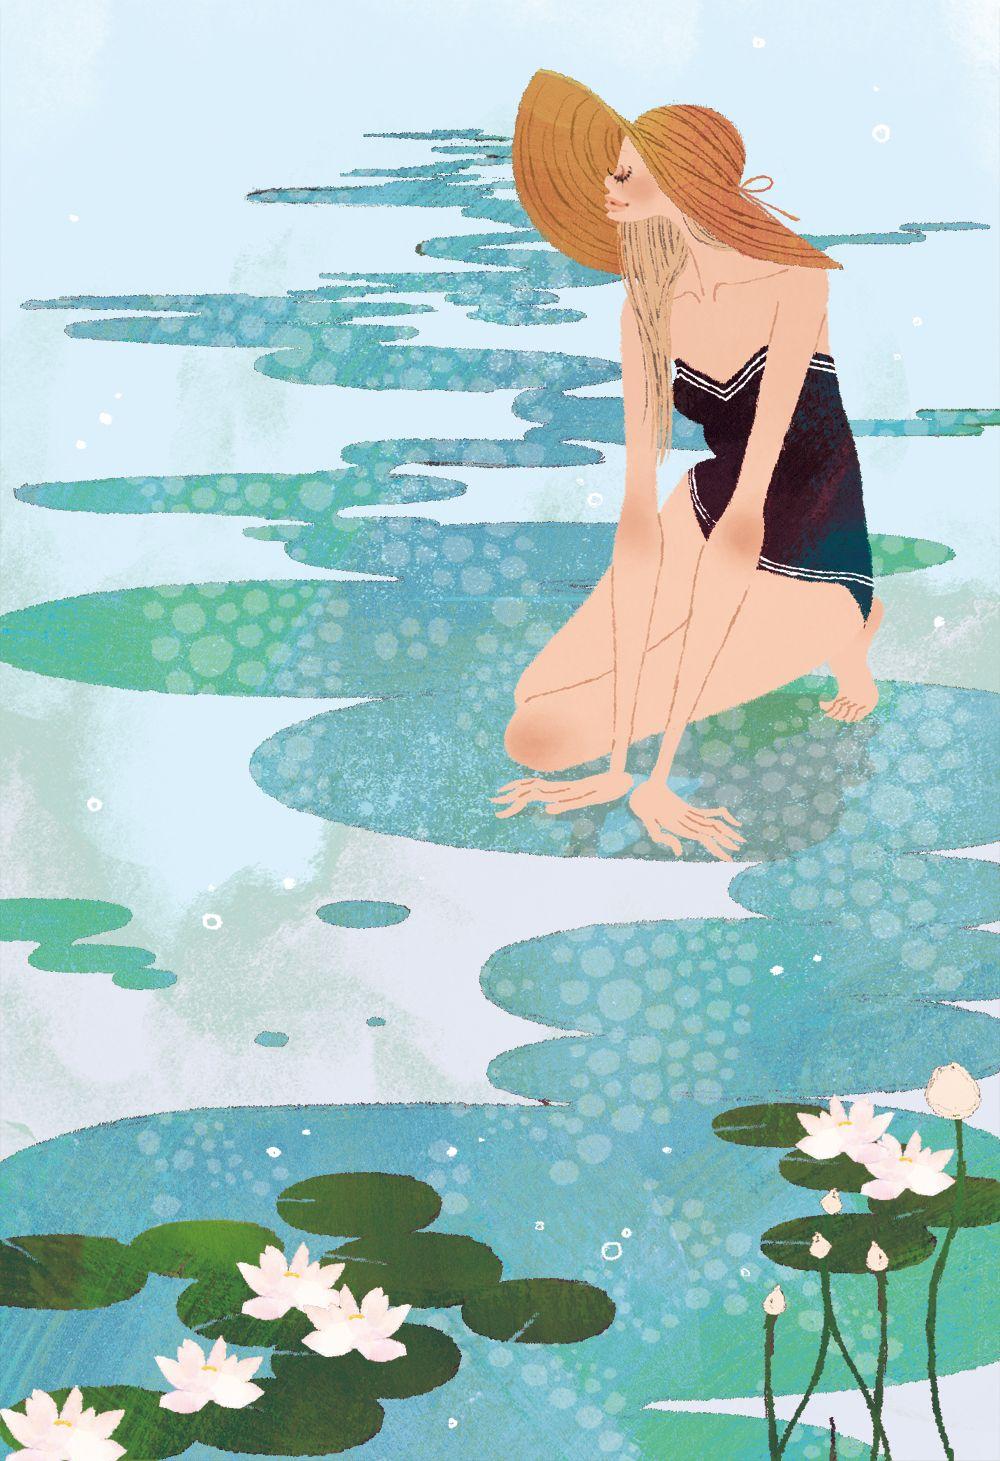 Springtime illustration by Yuko Yoshioka.